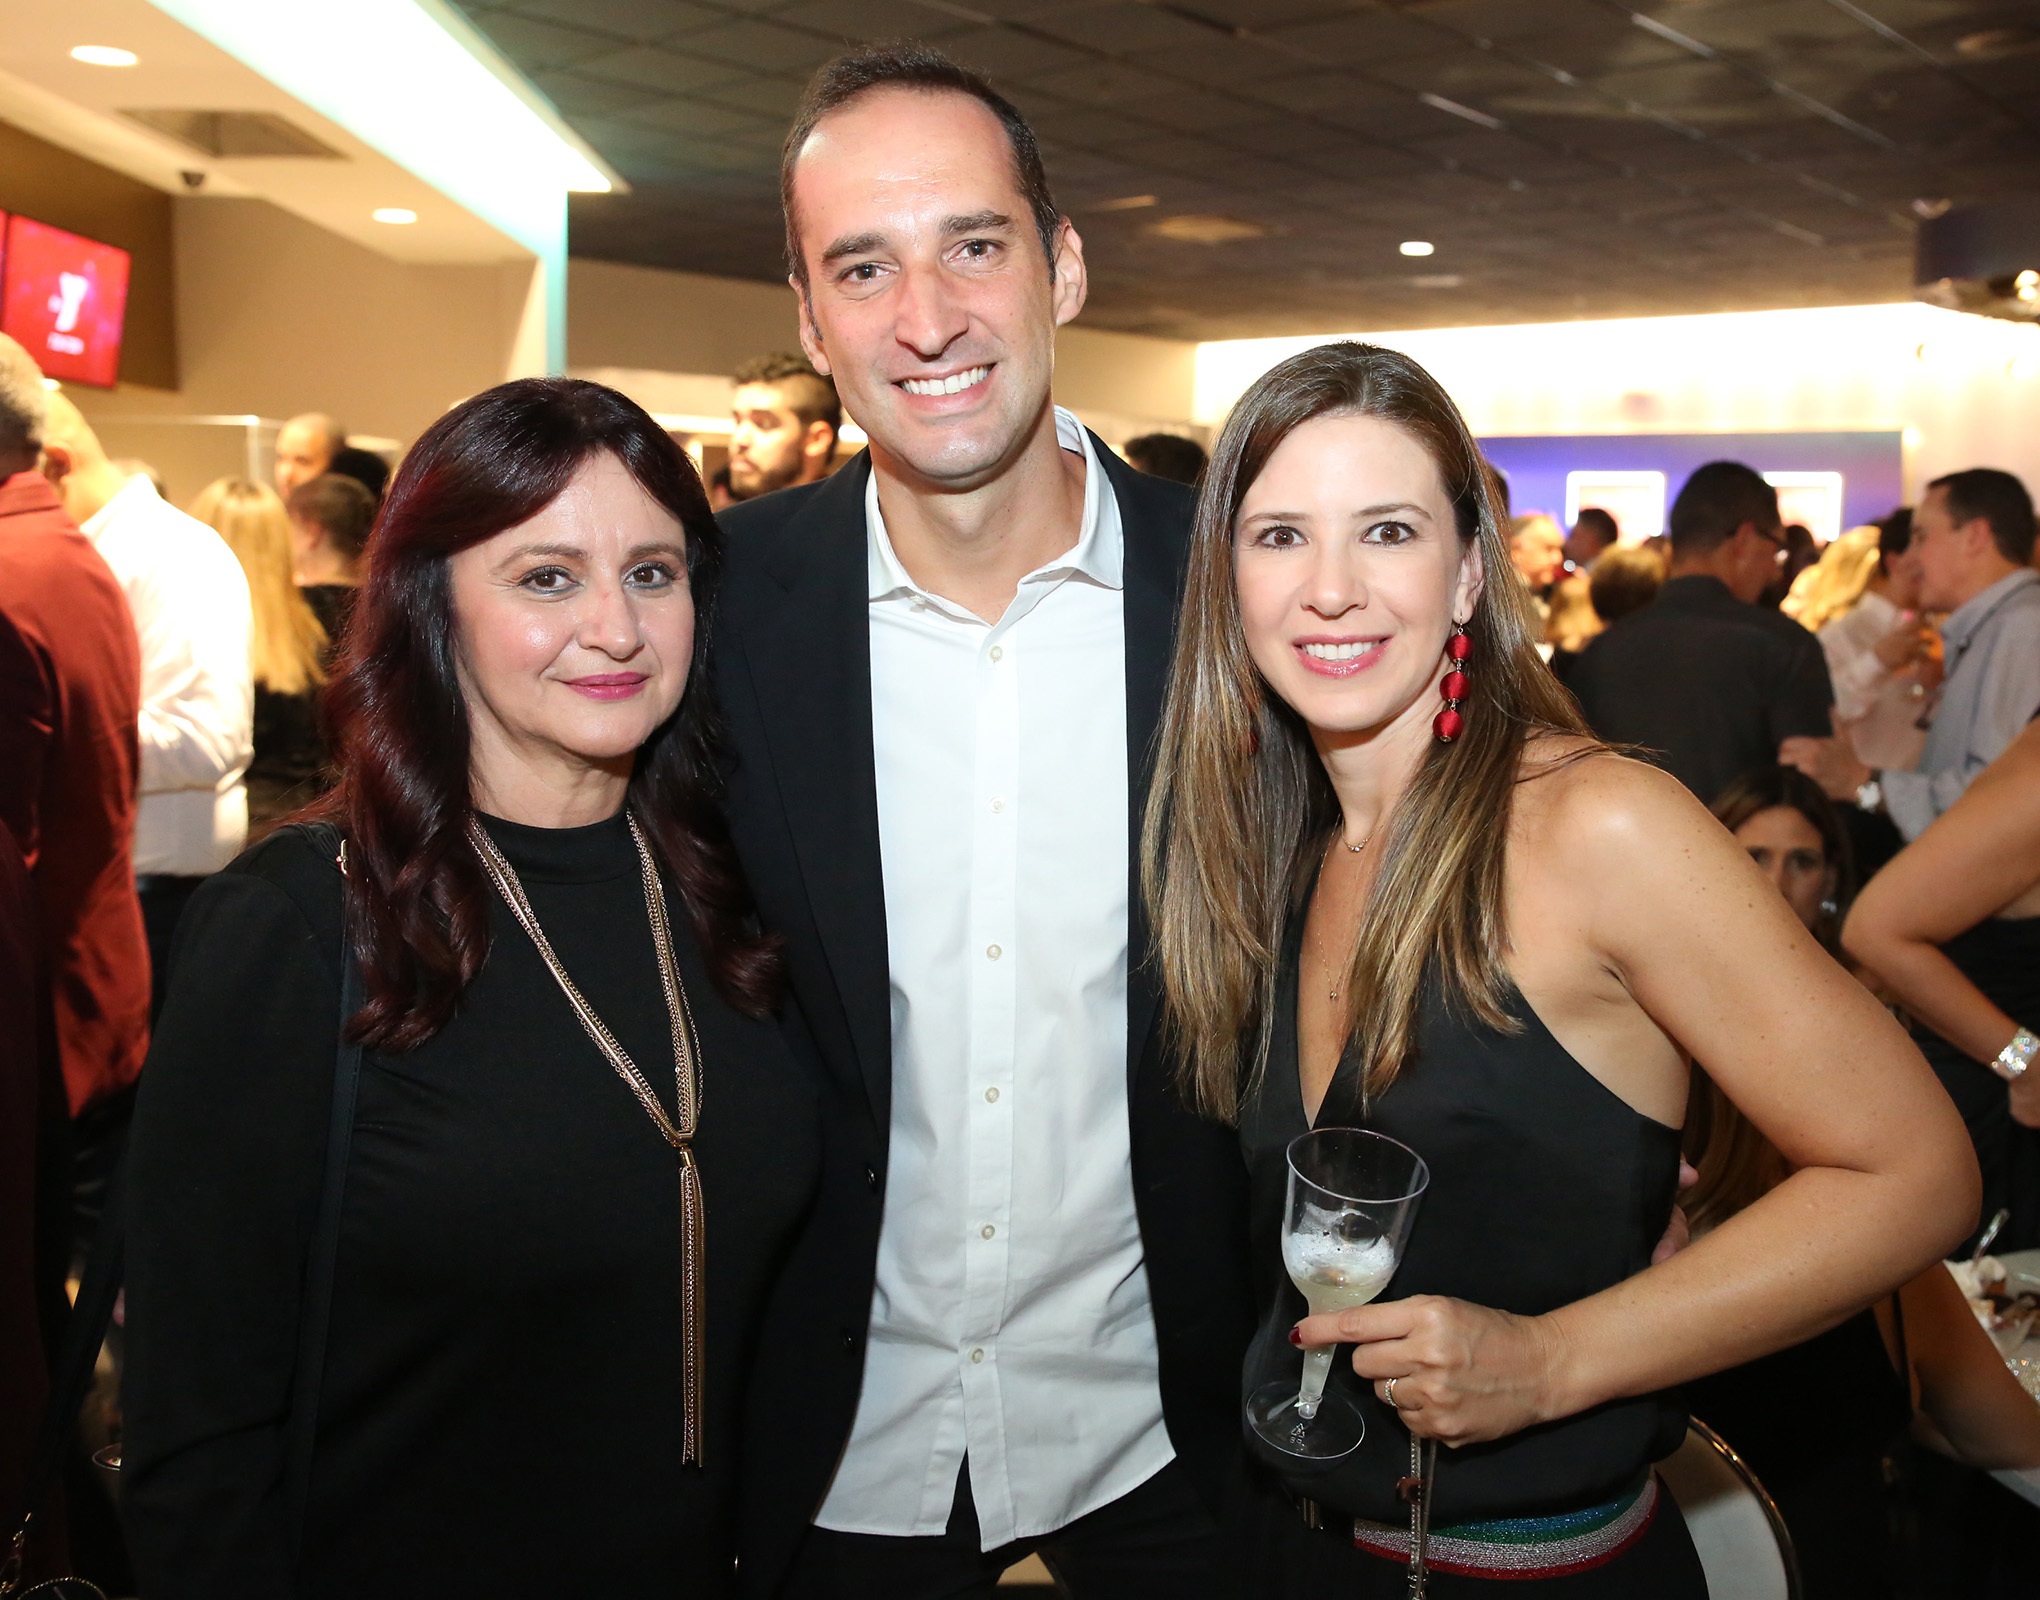 Nelly Torres, Renato D'Angelo y Grazielle Leite.  (José R. Pérez Centeno)